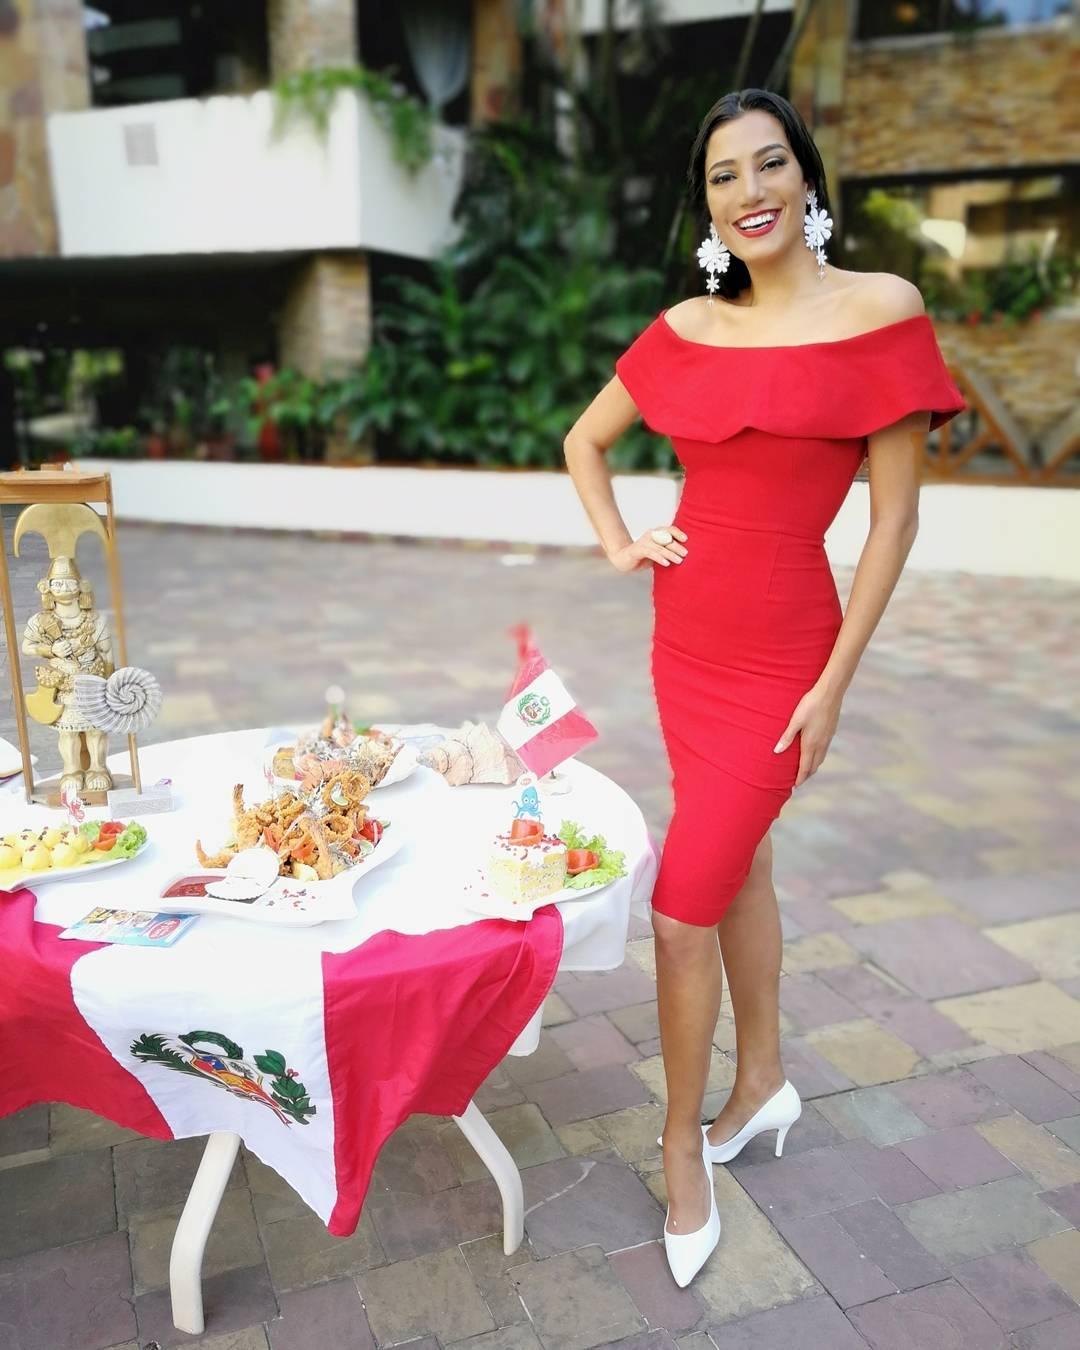 lorena larriviere, 8va finalista de reyna hispanoamericana 2017/miss supranational peru 2015. - Página 4 22710811